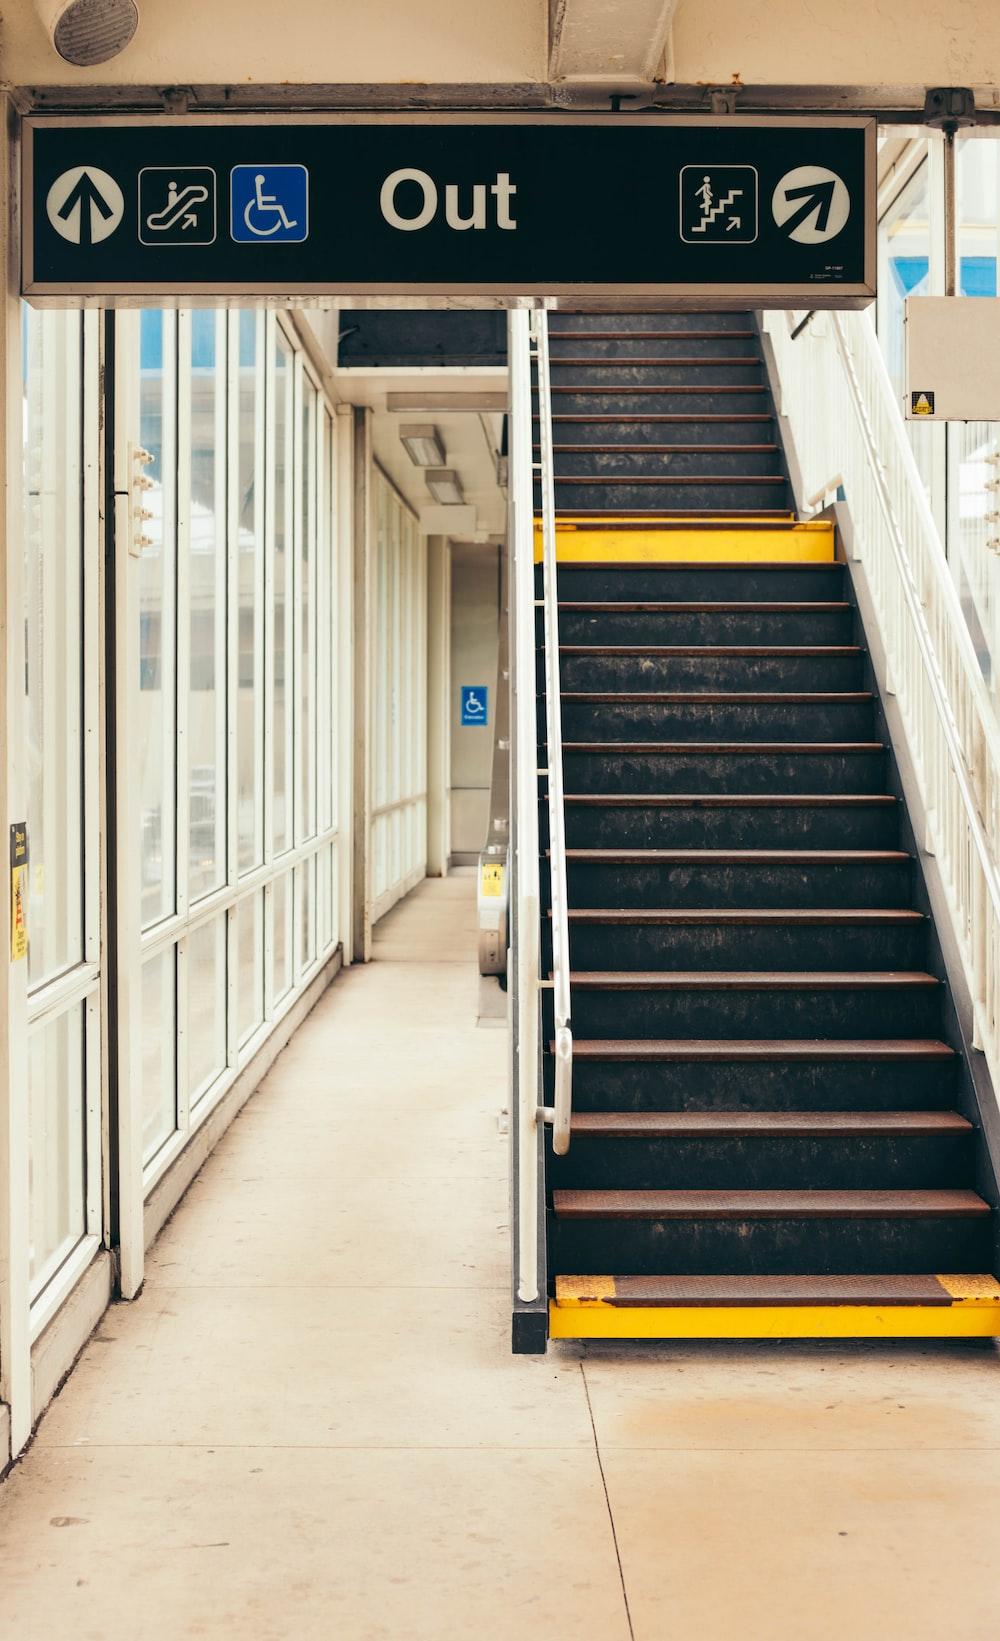 turned-off escalator